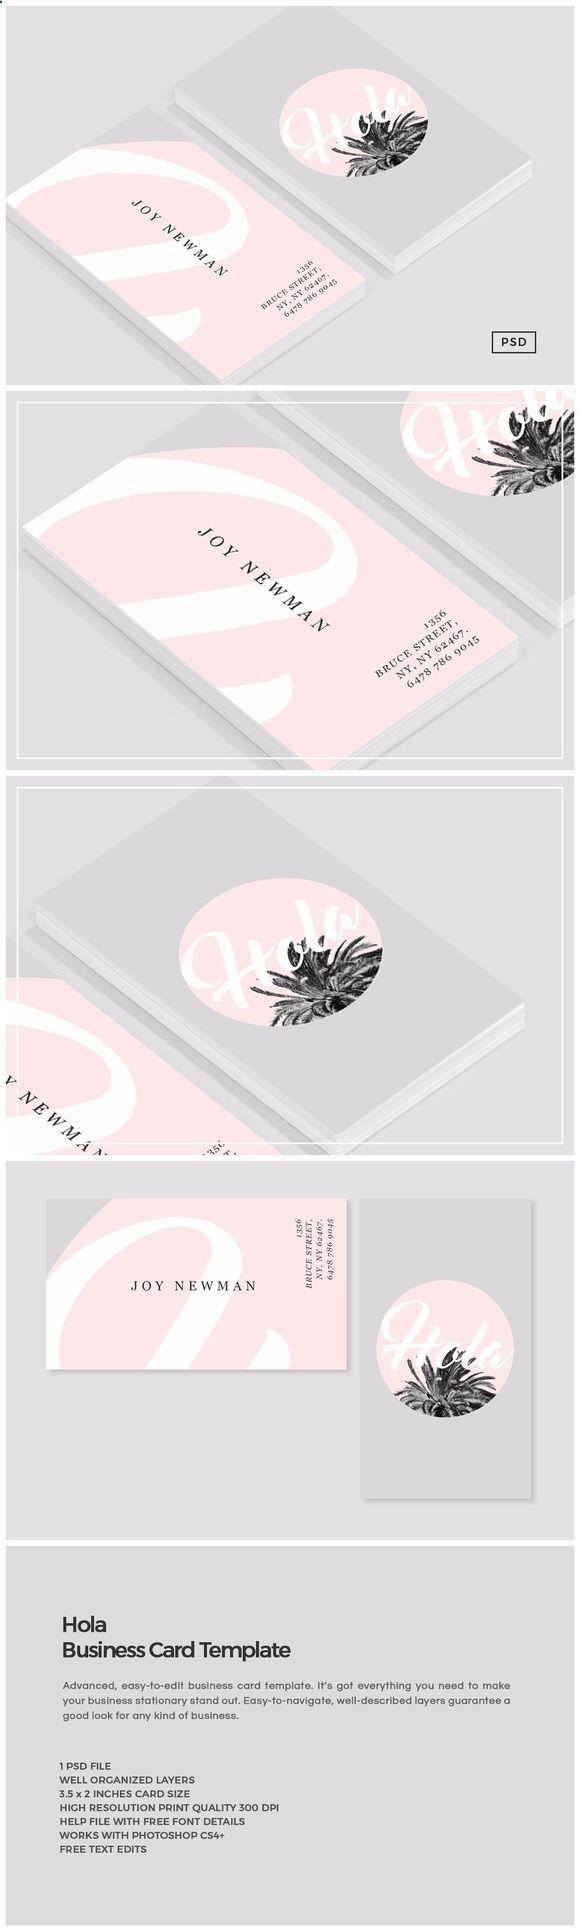 Hola Business Card Template creativemarket.co... #design #art ...